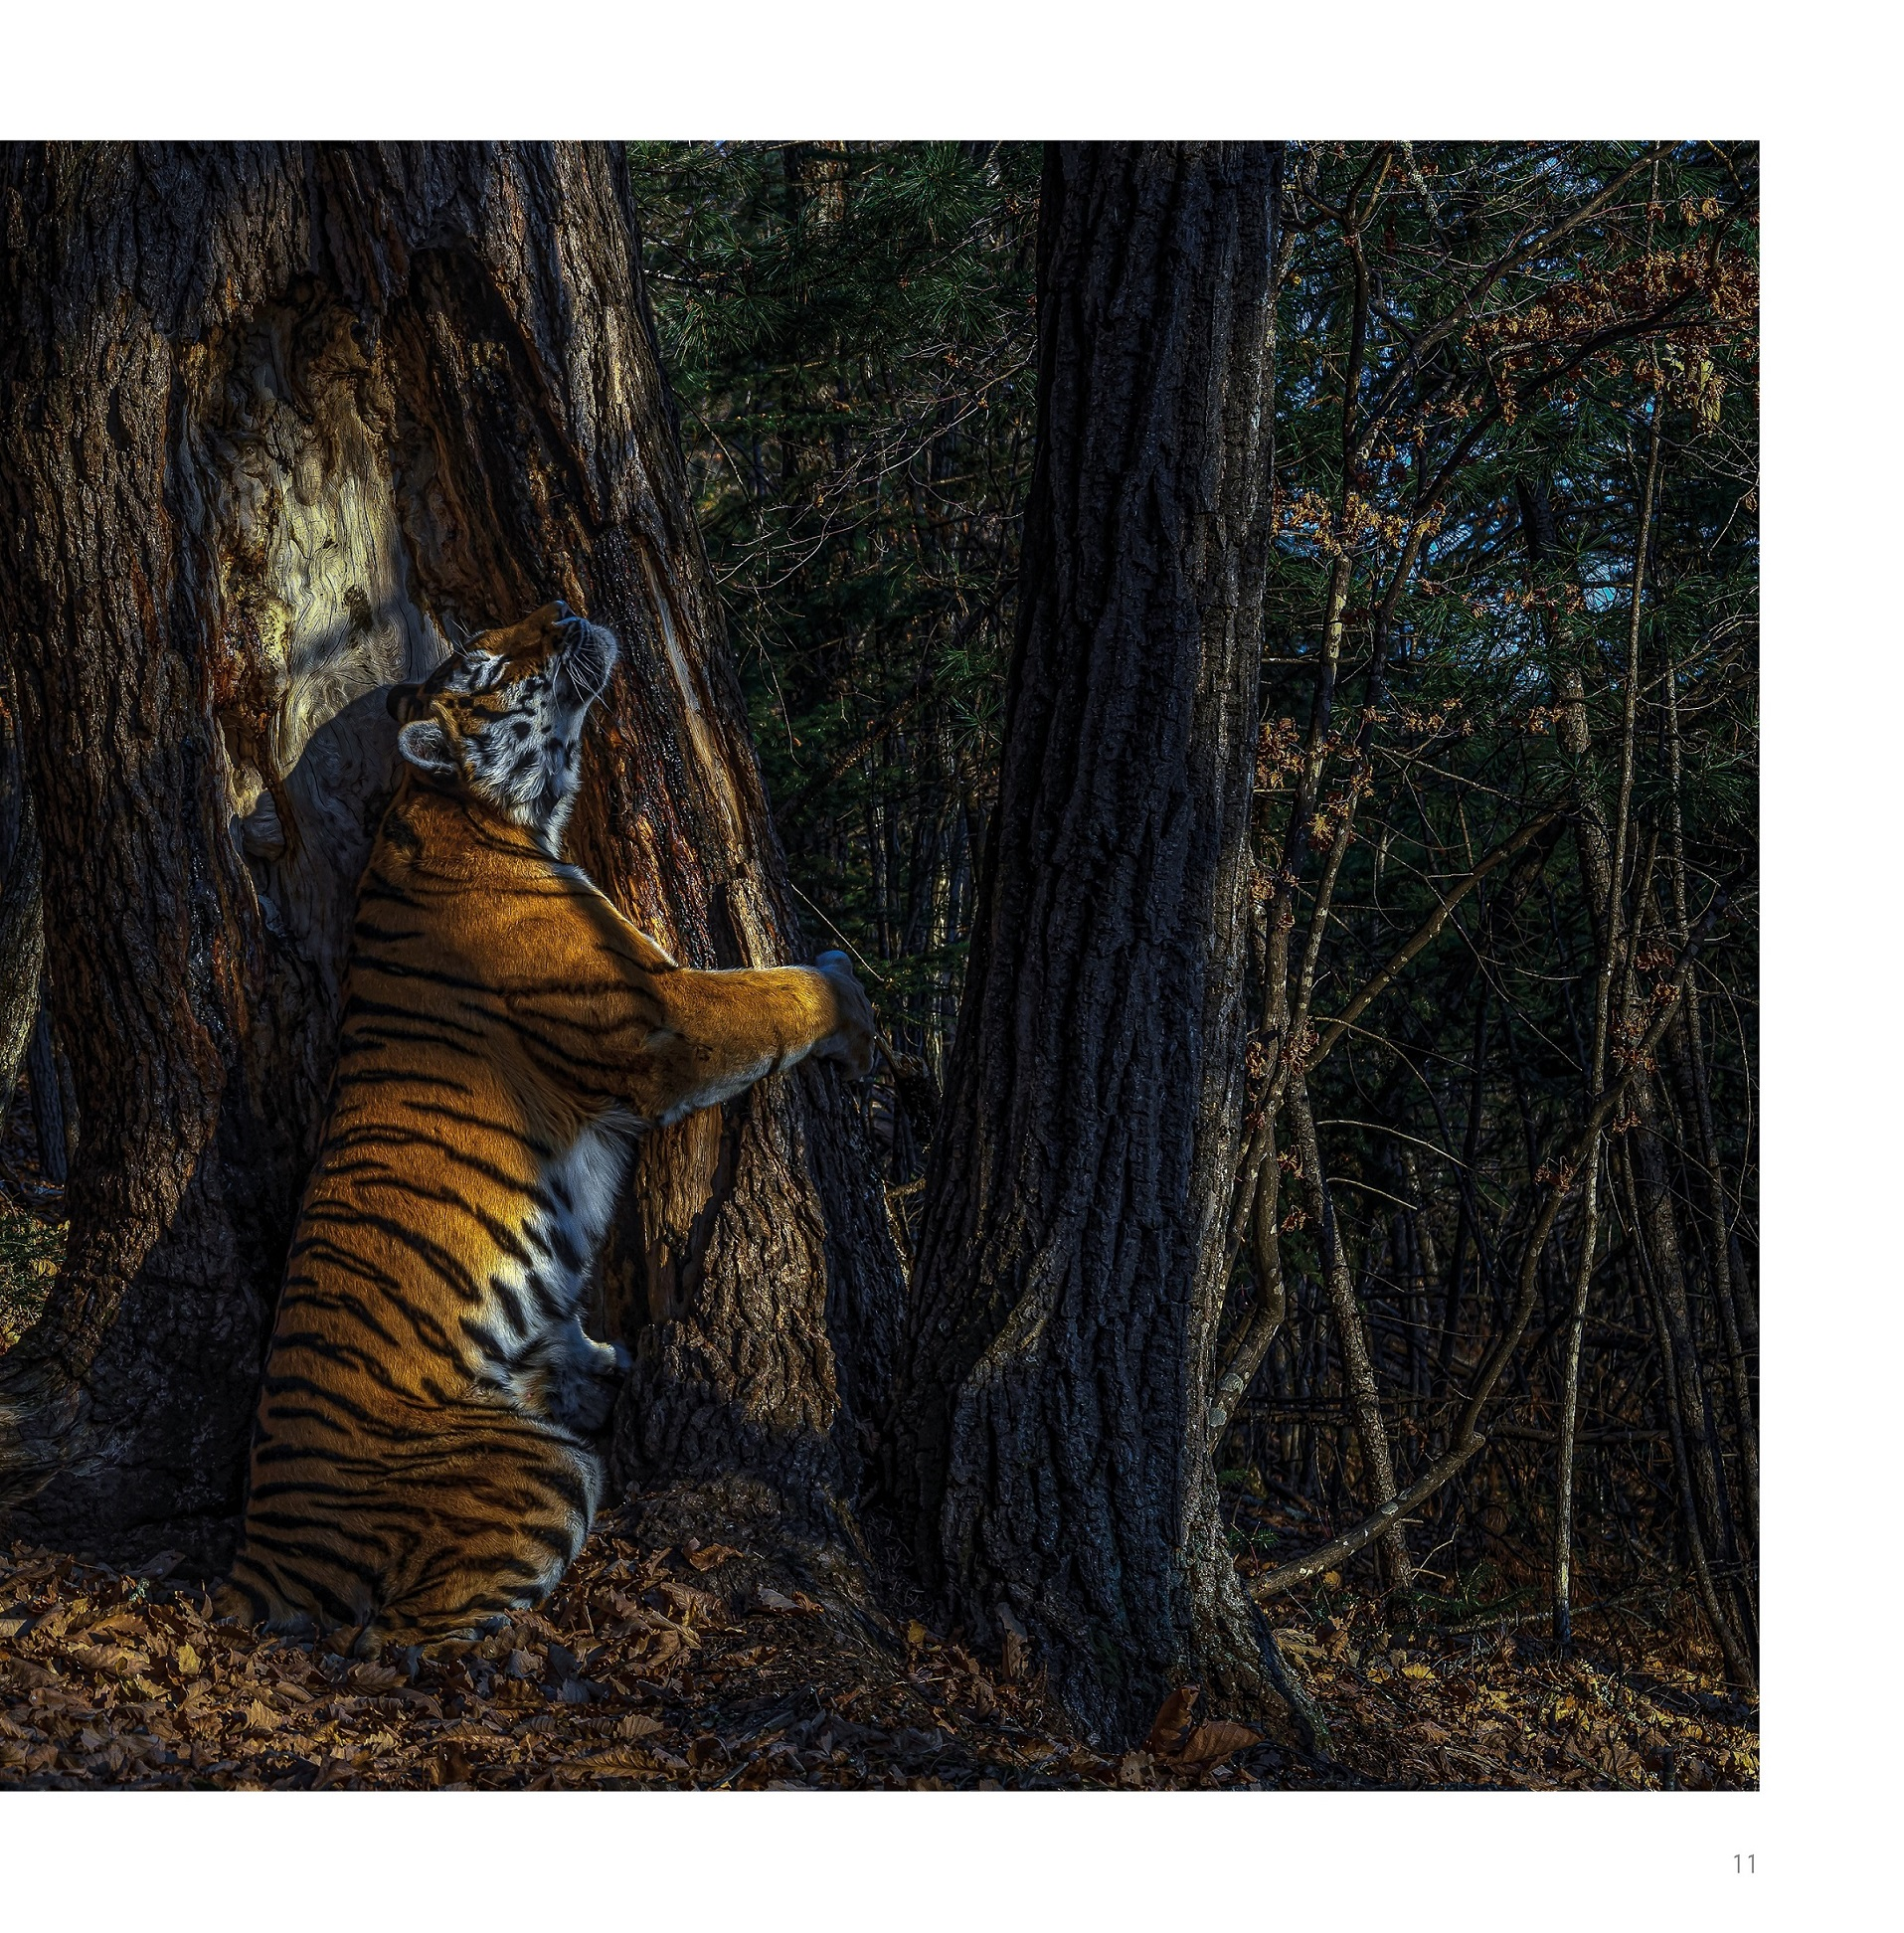 Wildlife Photographer of the Year 2020 - Les plus belles photos de nature - image gagnante